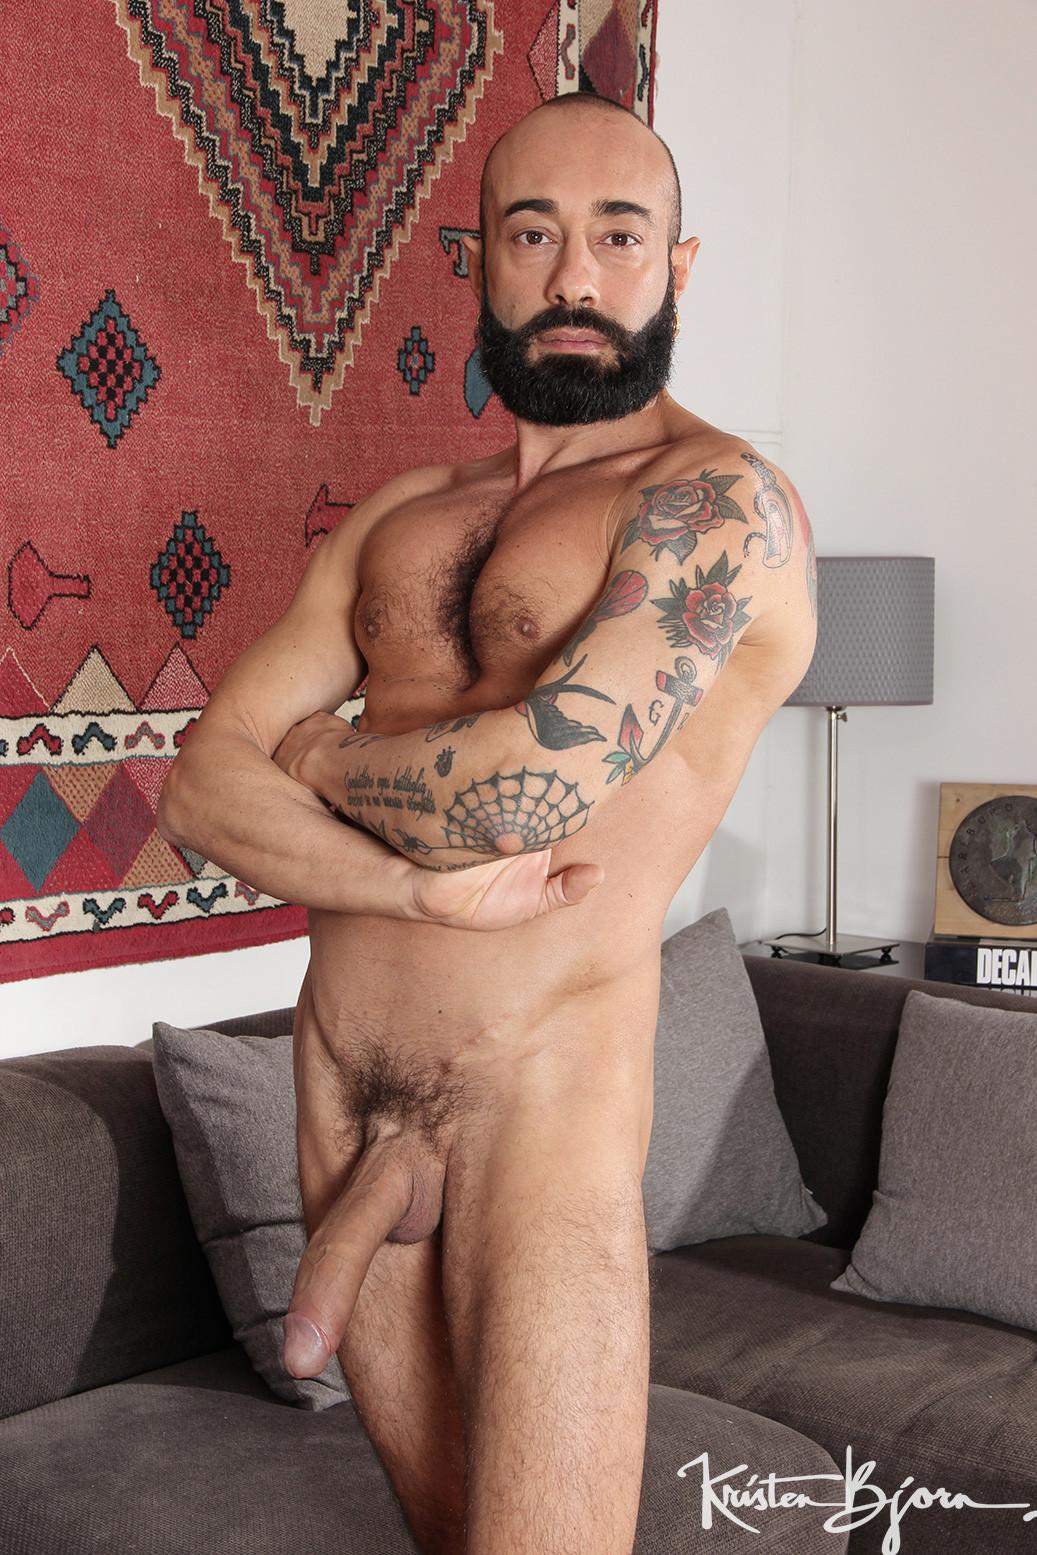 Gianni Maggio fuck Malek Tobias gay hot daddy dude men porn Nobody Like You